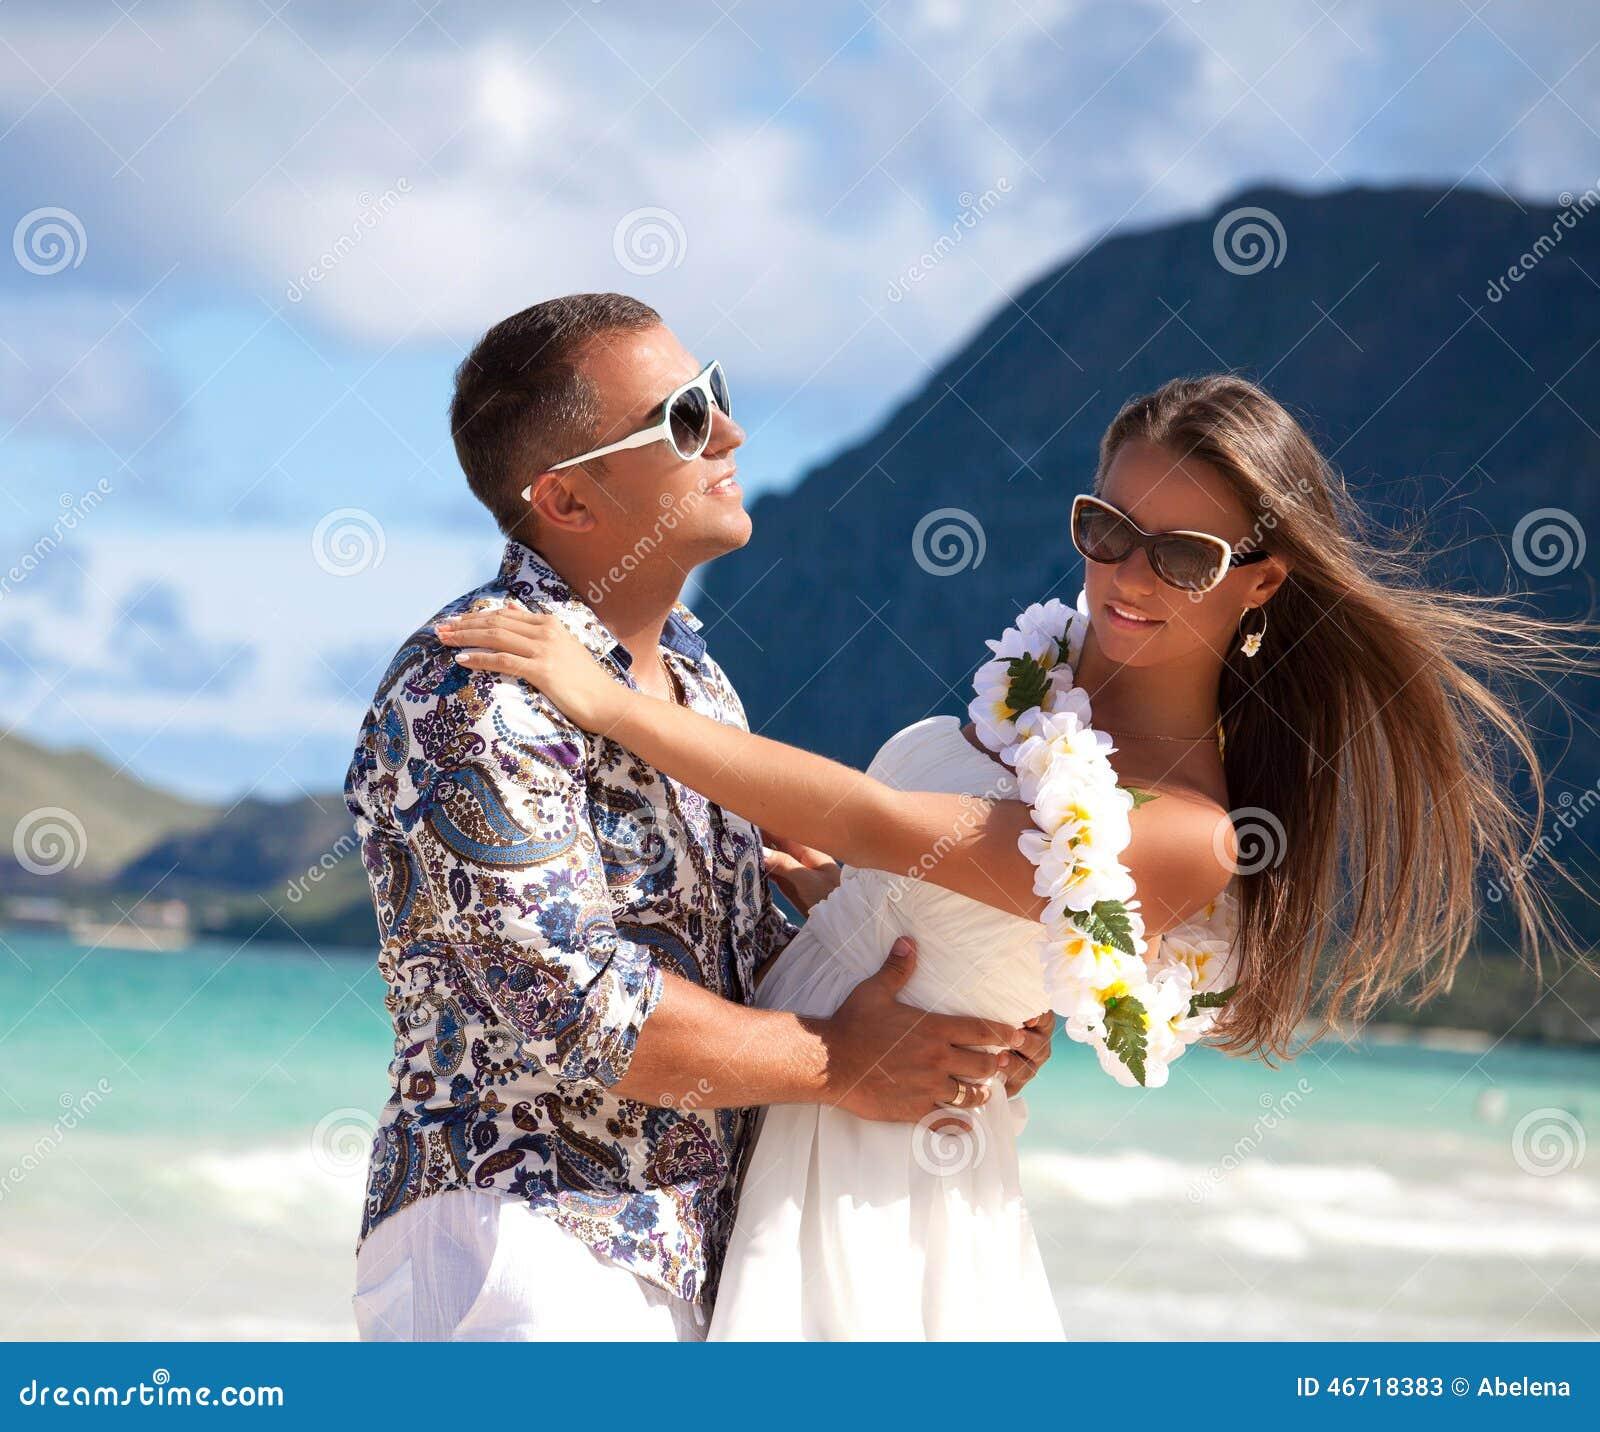 Couple Enjoying Their Summer Holidays Stock Photo: Beach Couple Travel. Stock Image. Image Of Enjoy, Ocean